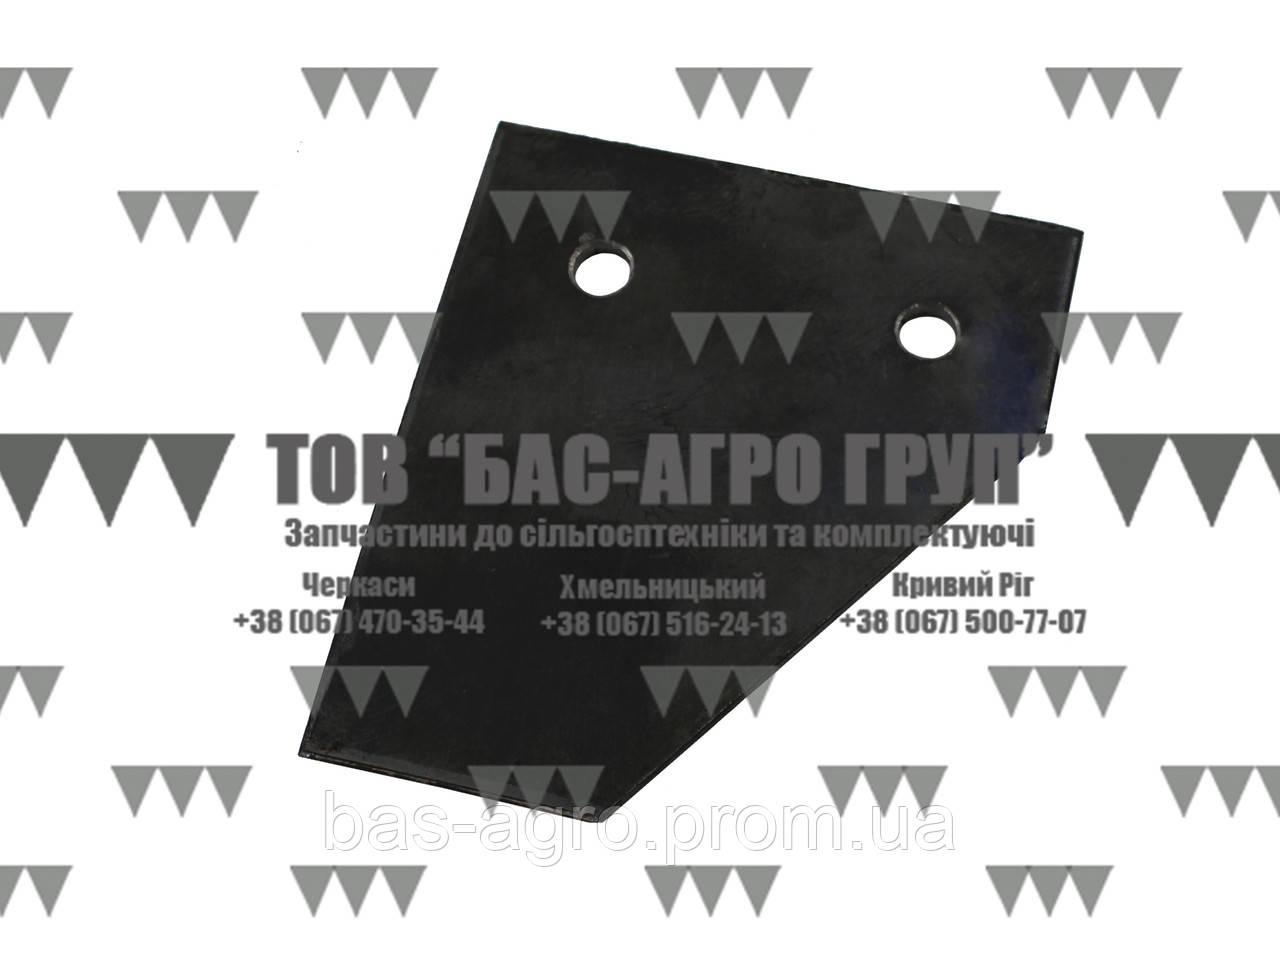 Направляющая пластина ножа 616286.0 Claas оригинал